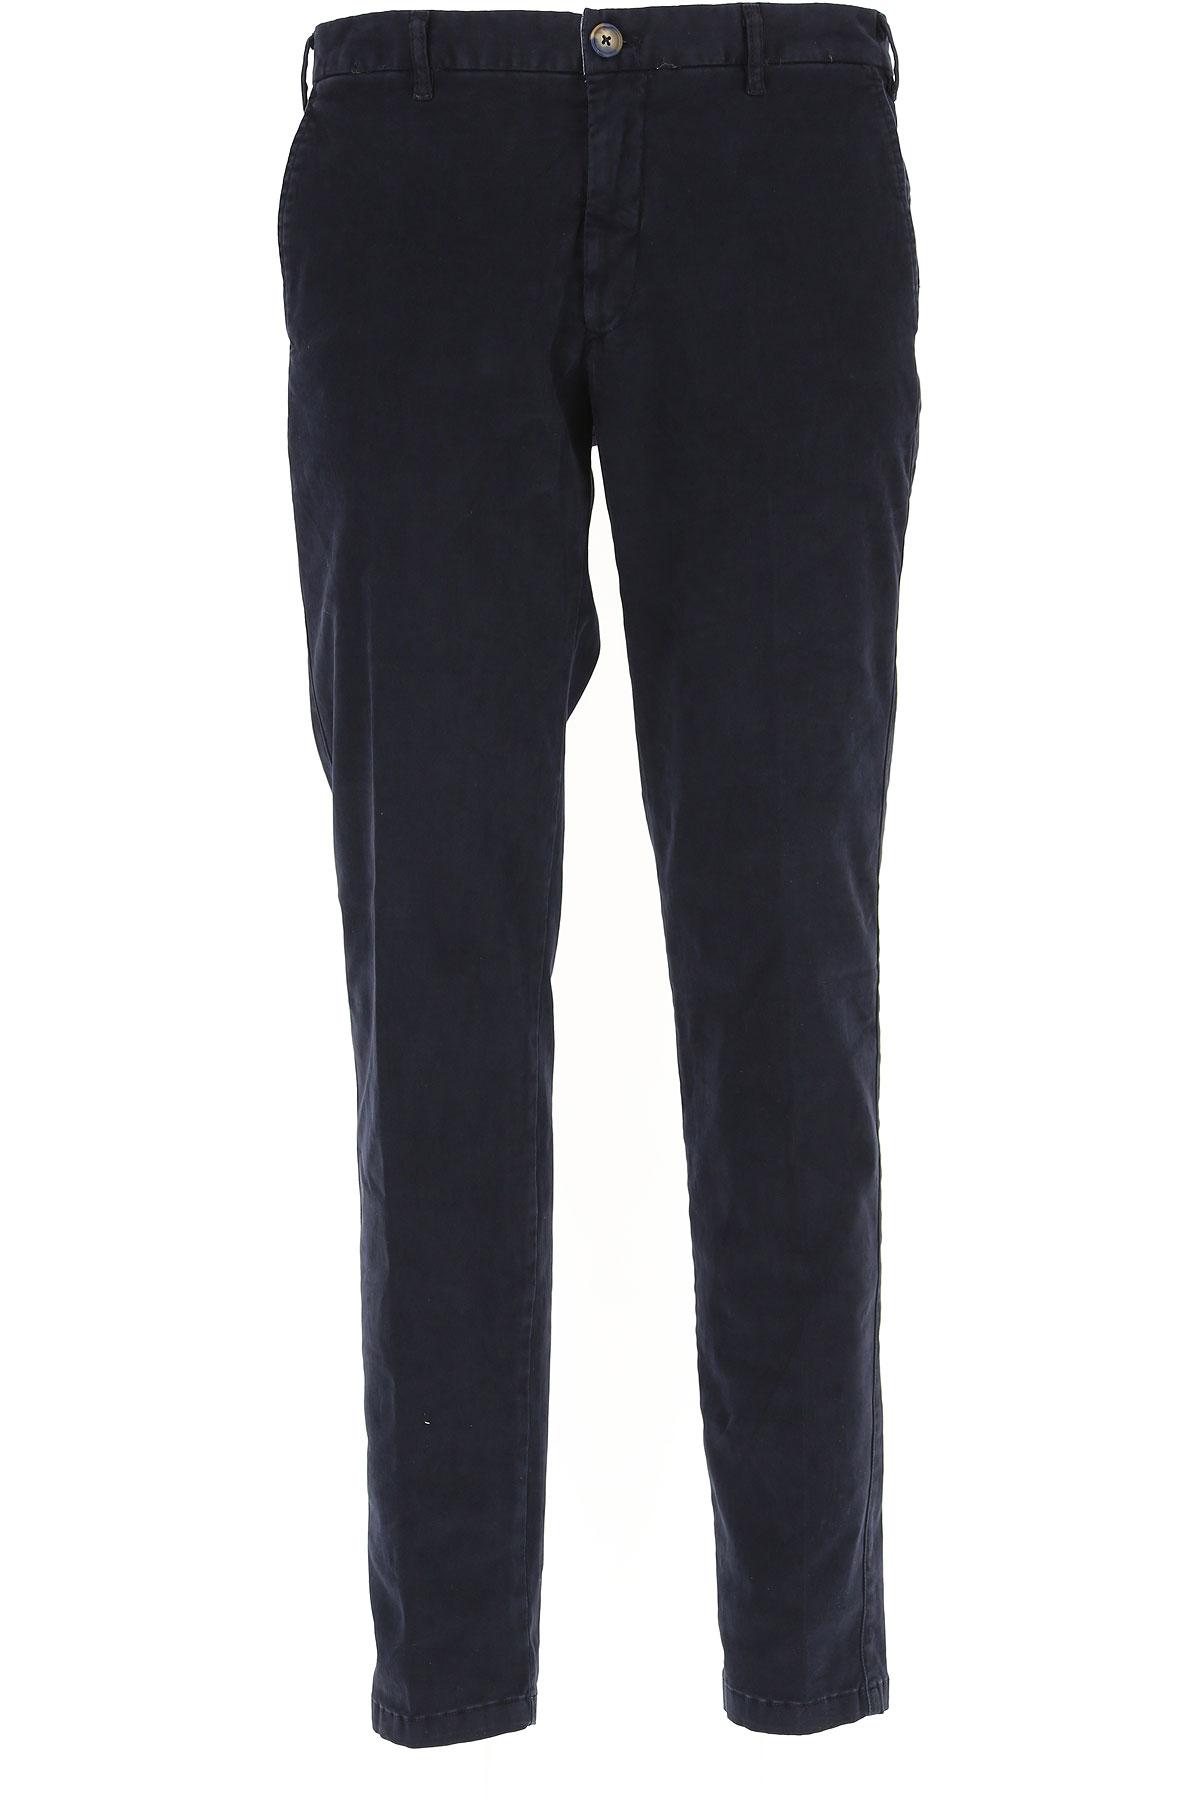 Image of J.W. Brine Pants for Men, navy, Cotton, 2017, 30 32 34 36 38 40